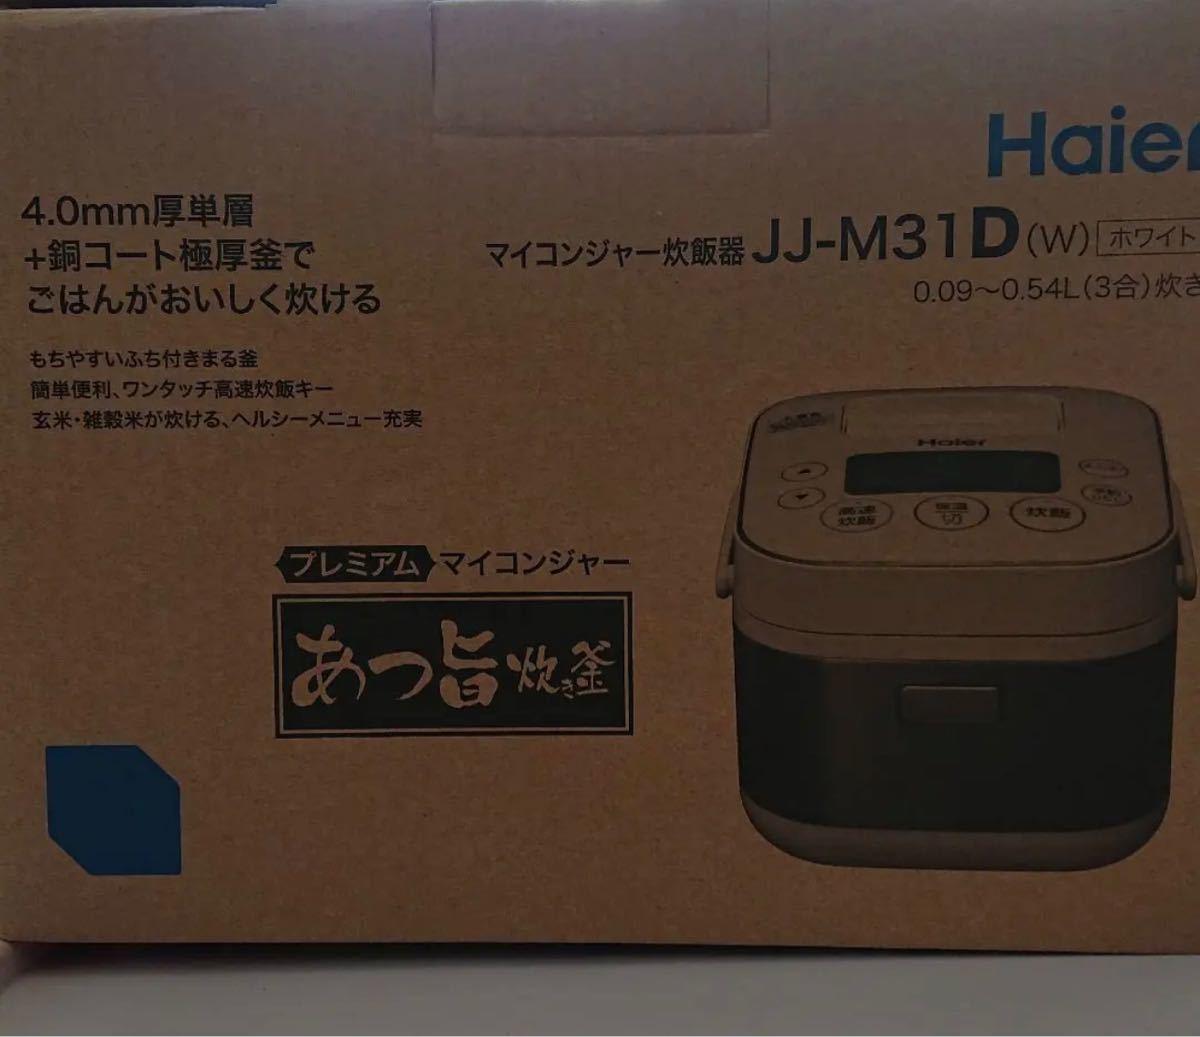 Haier炊飯器 JJ-M31D(W) 3合